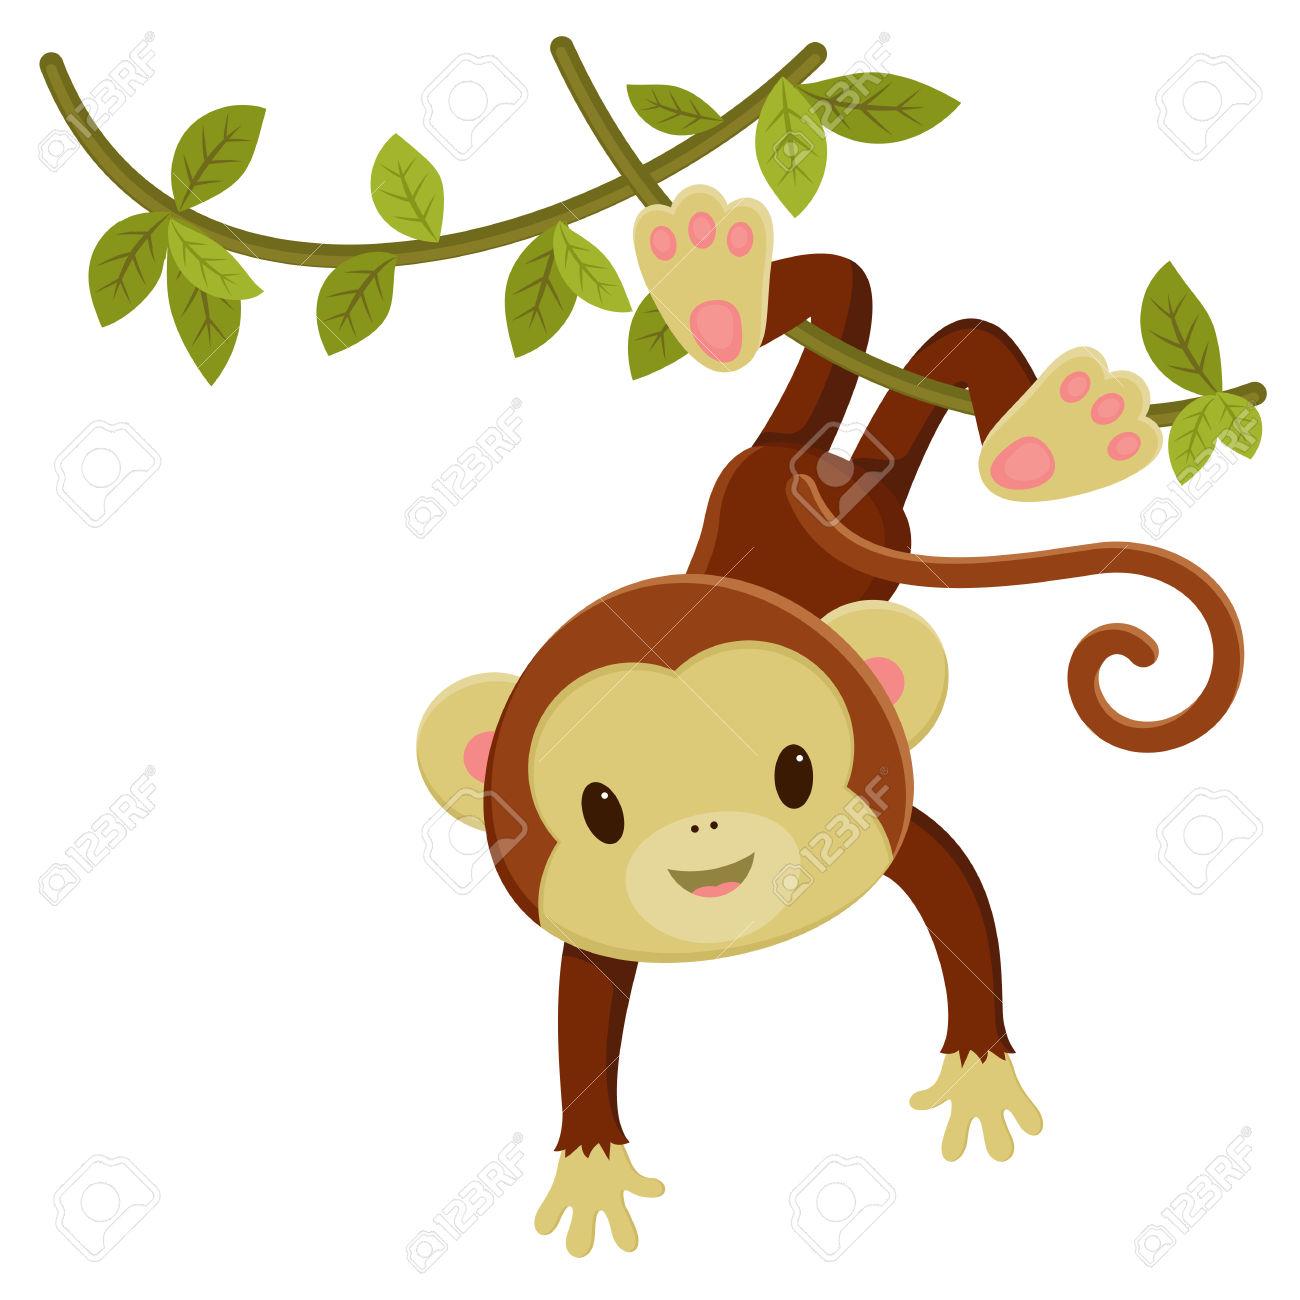 Cartoon free download best. Clipart monkey baby monkey